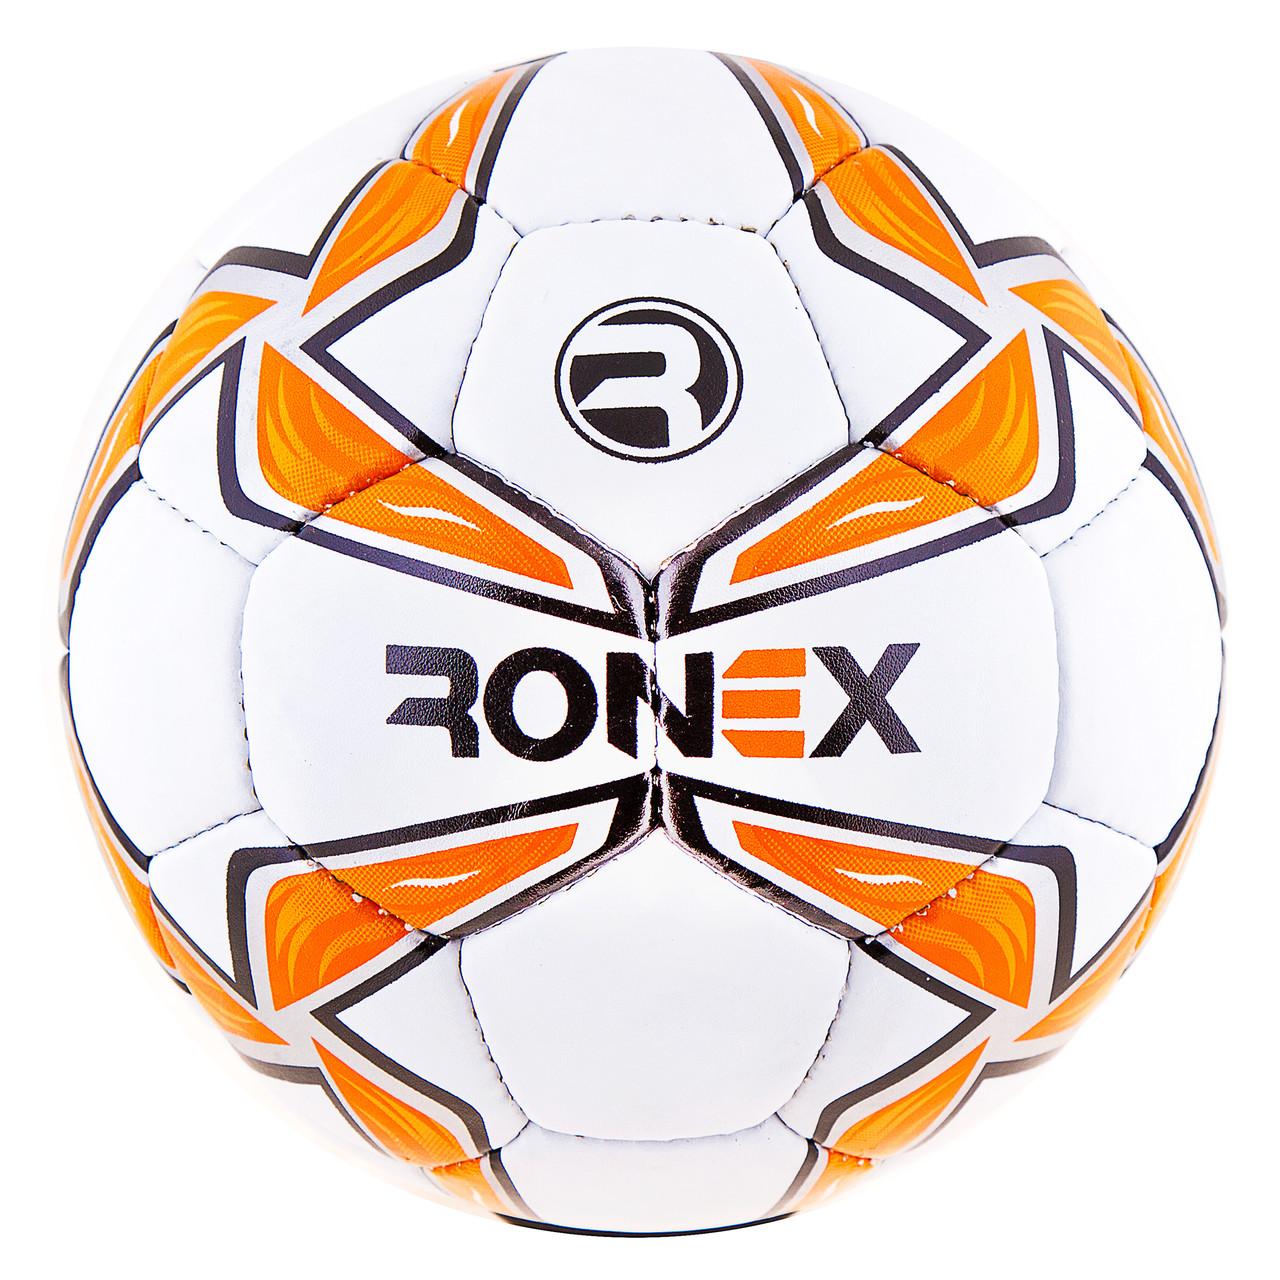 М'яч футбол Grippy Ronex-Molten помаранчевий RX-MOL-OR3